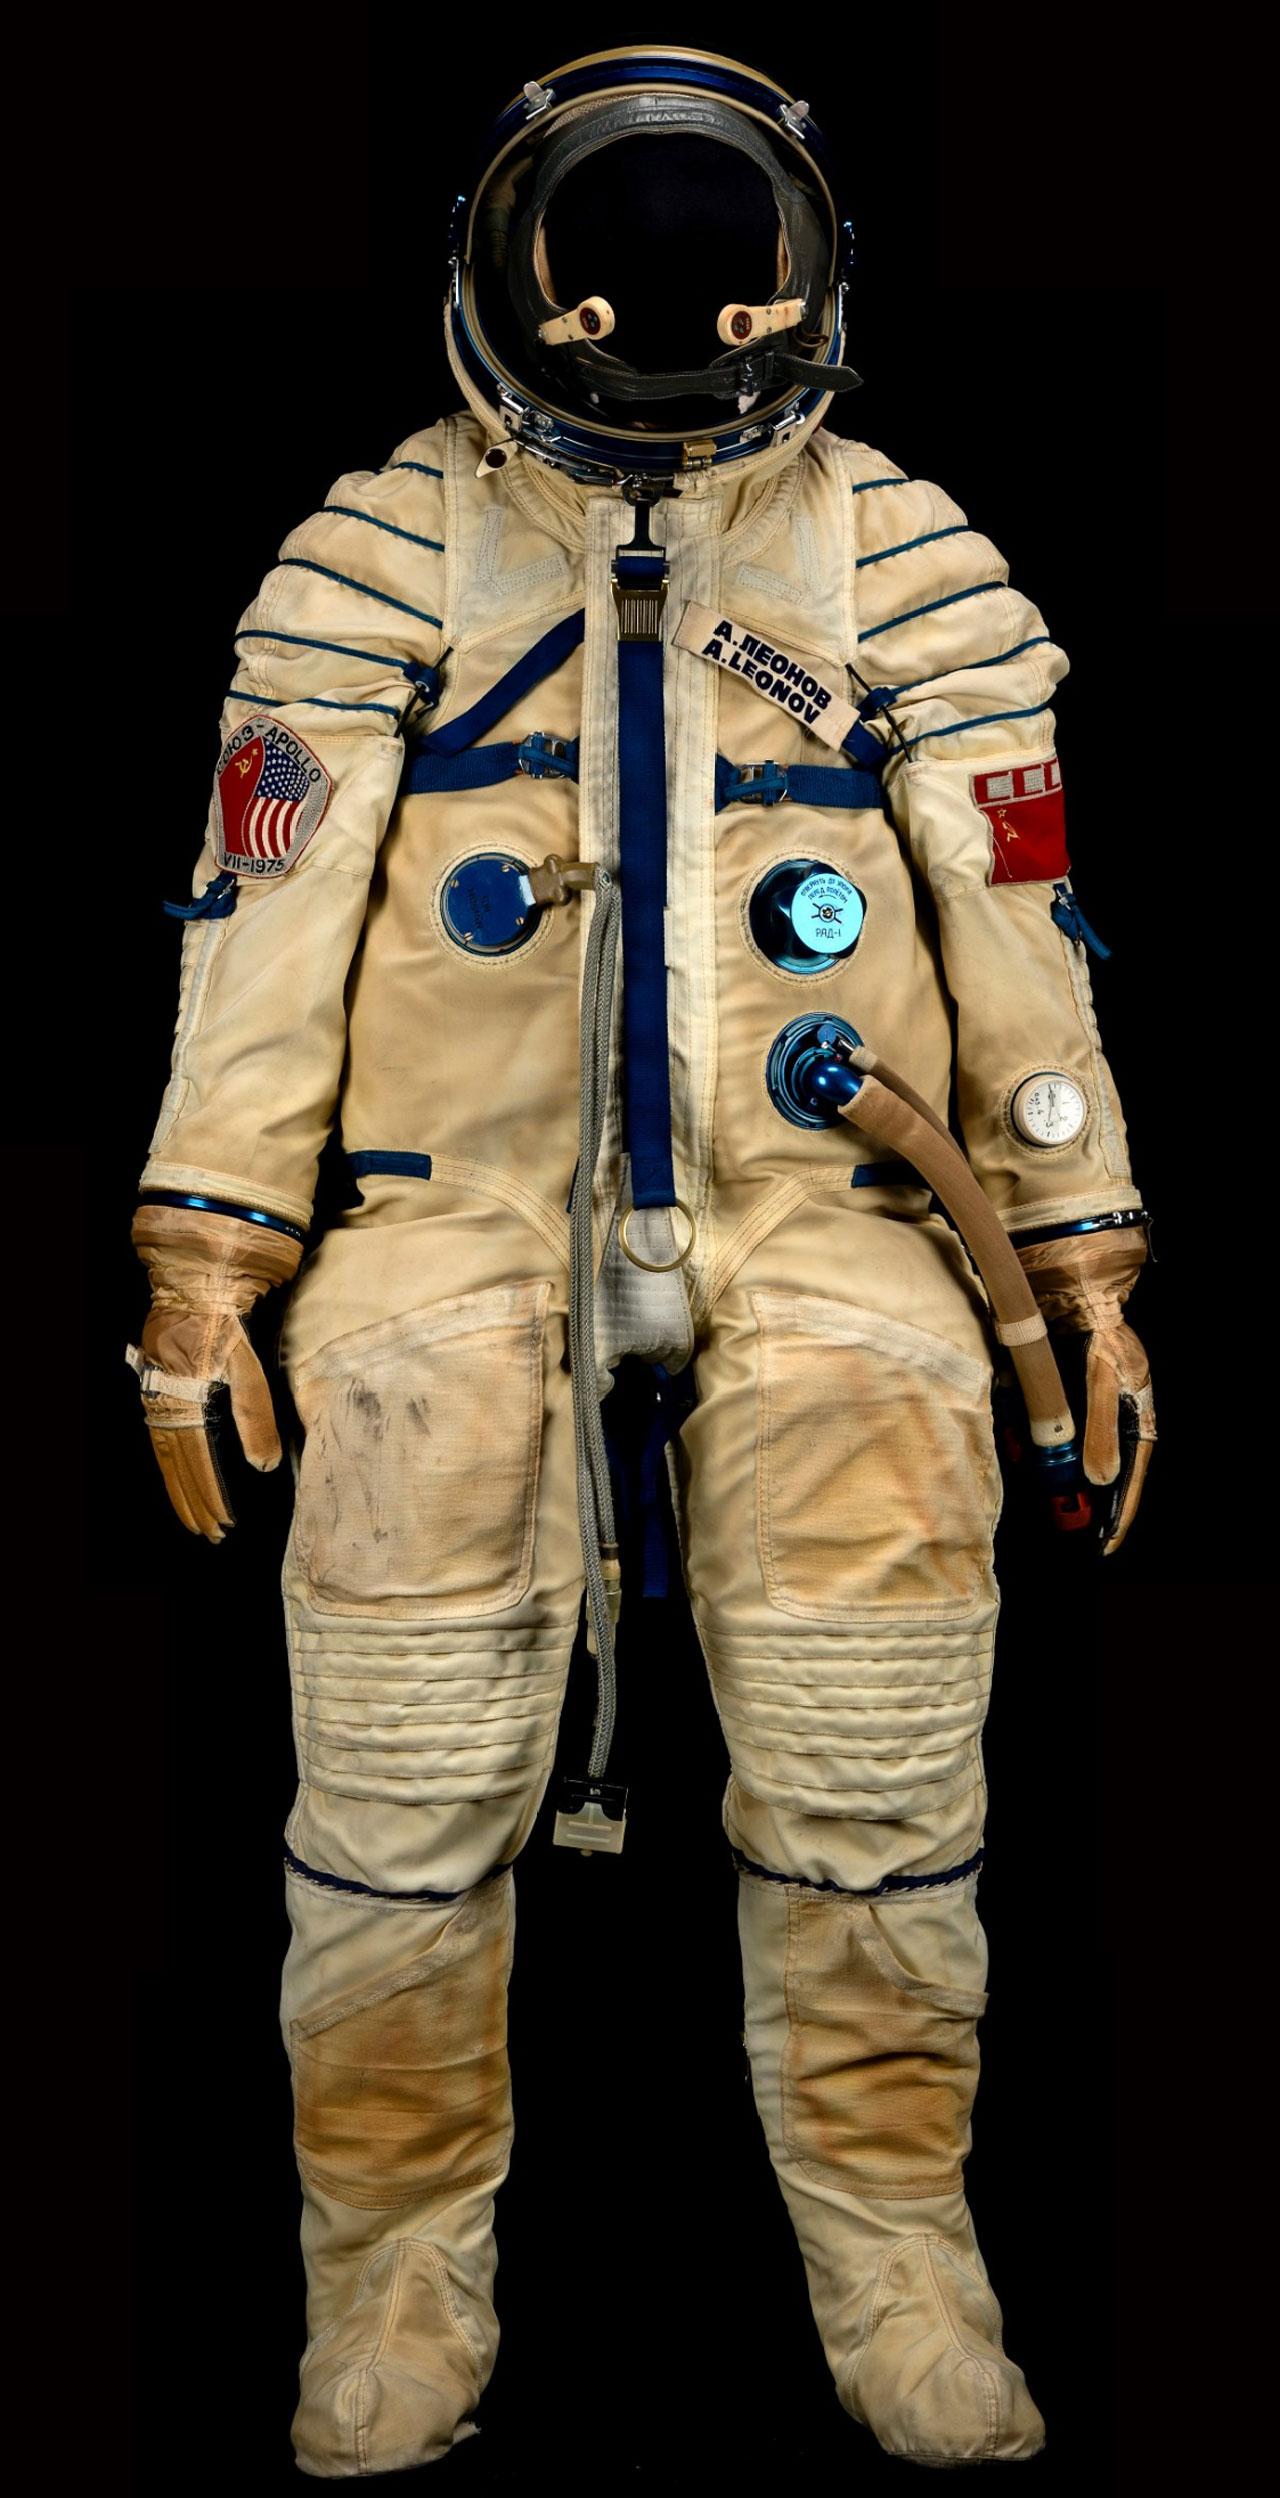 Alexei Leonov S Space Suit Sells For 242 000 At Bonhams